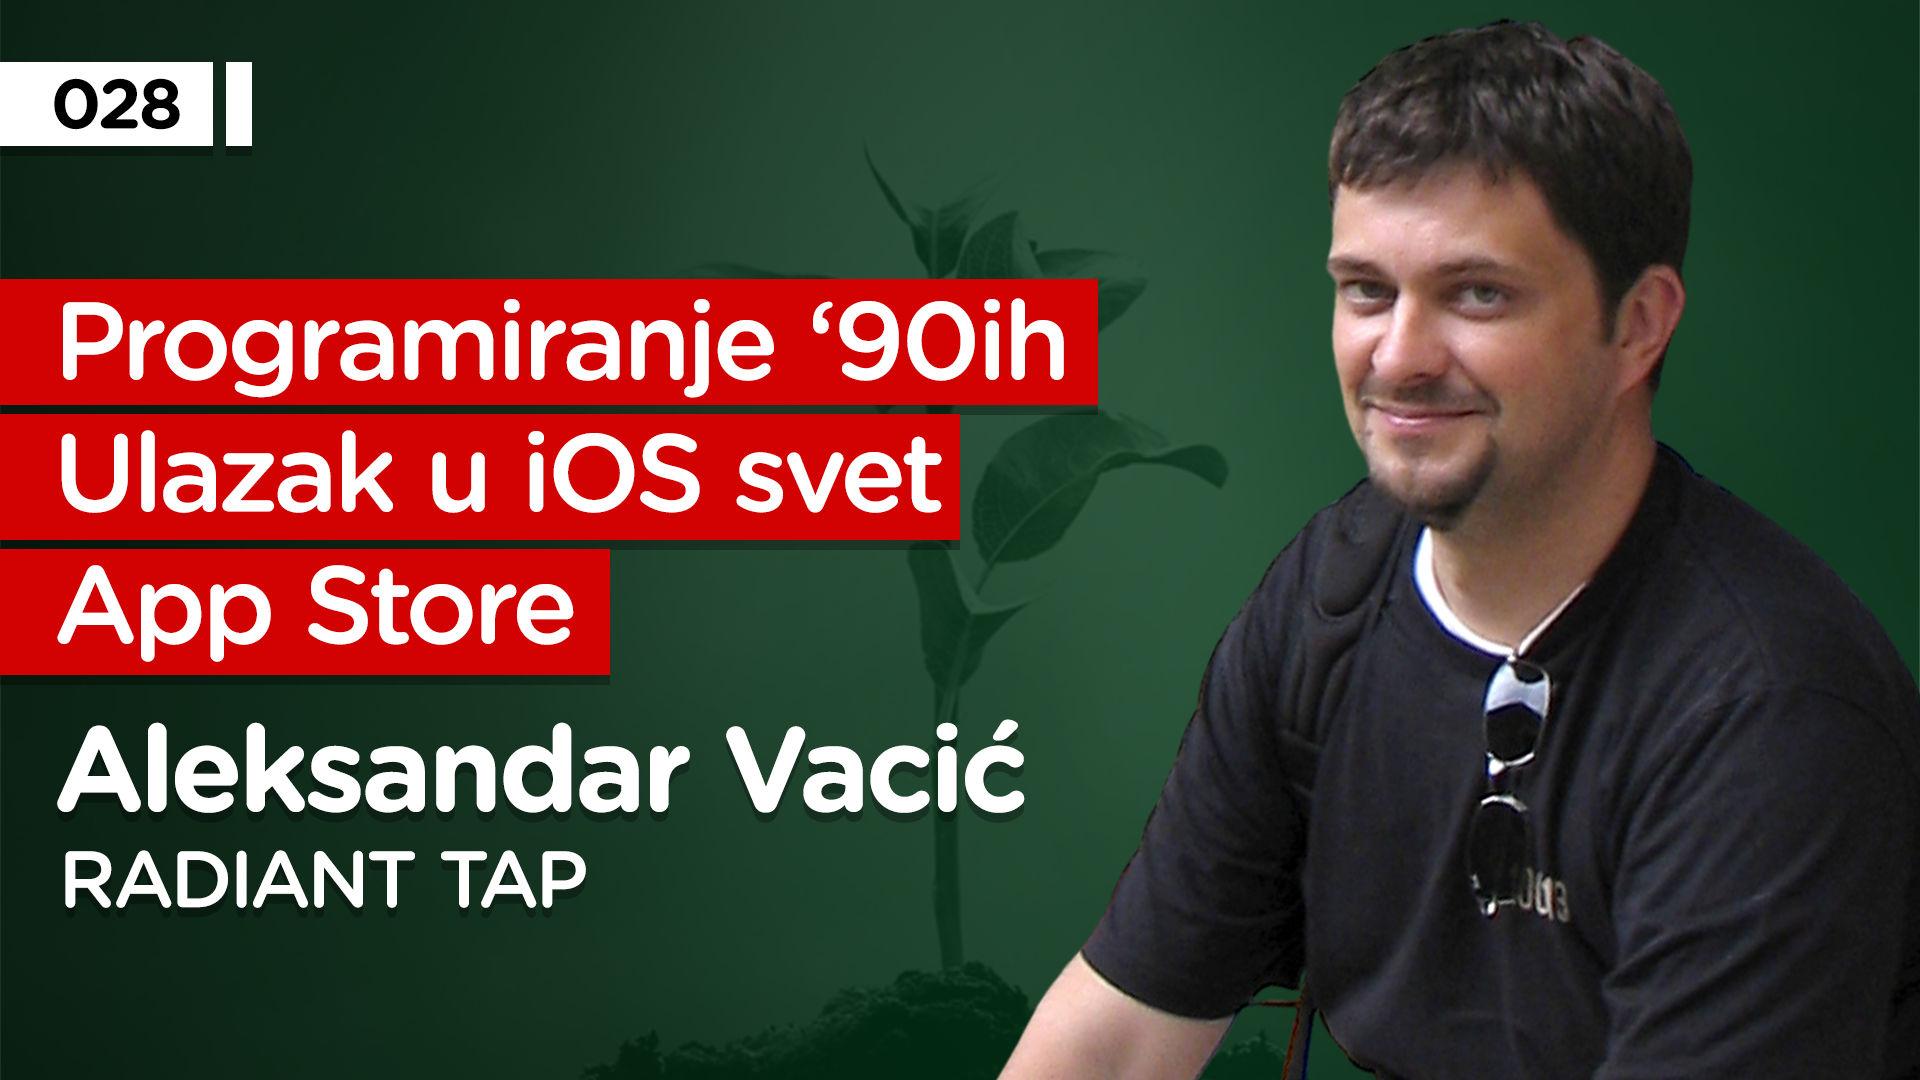 EP028: Aleksandar Vacić